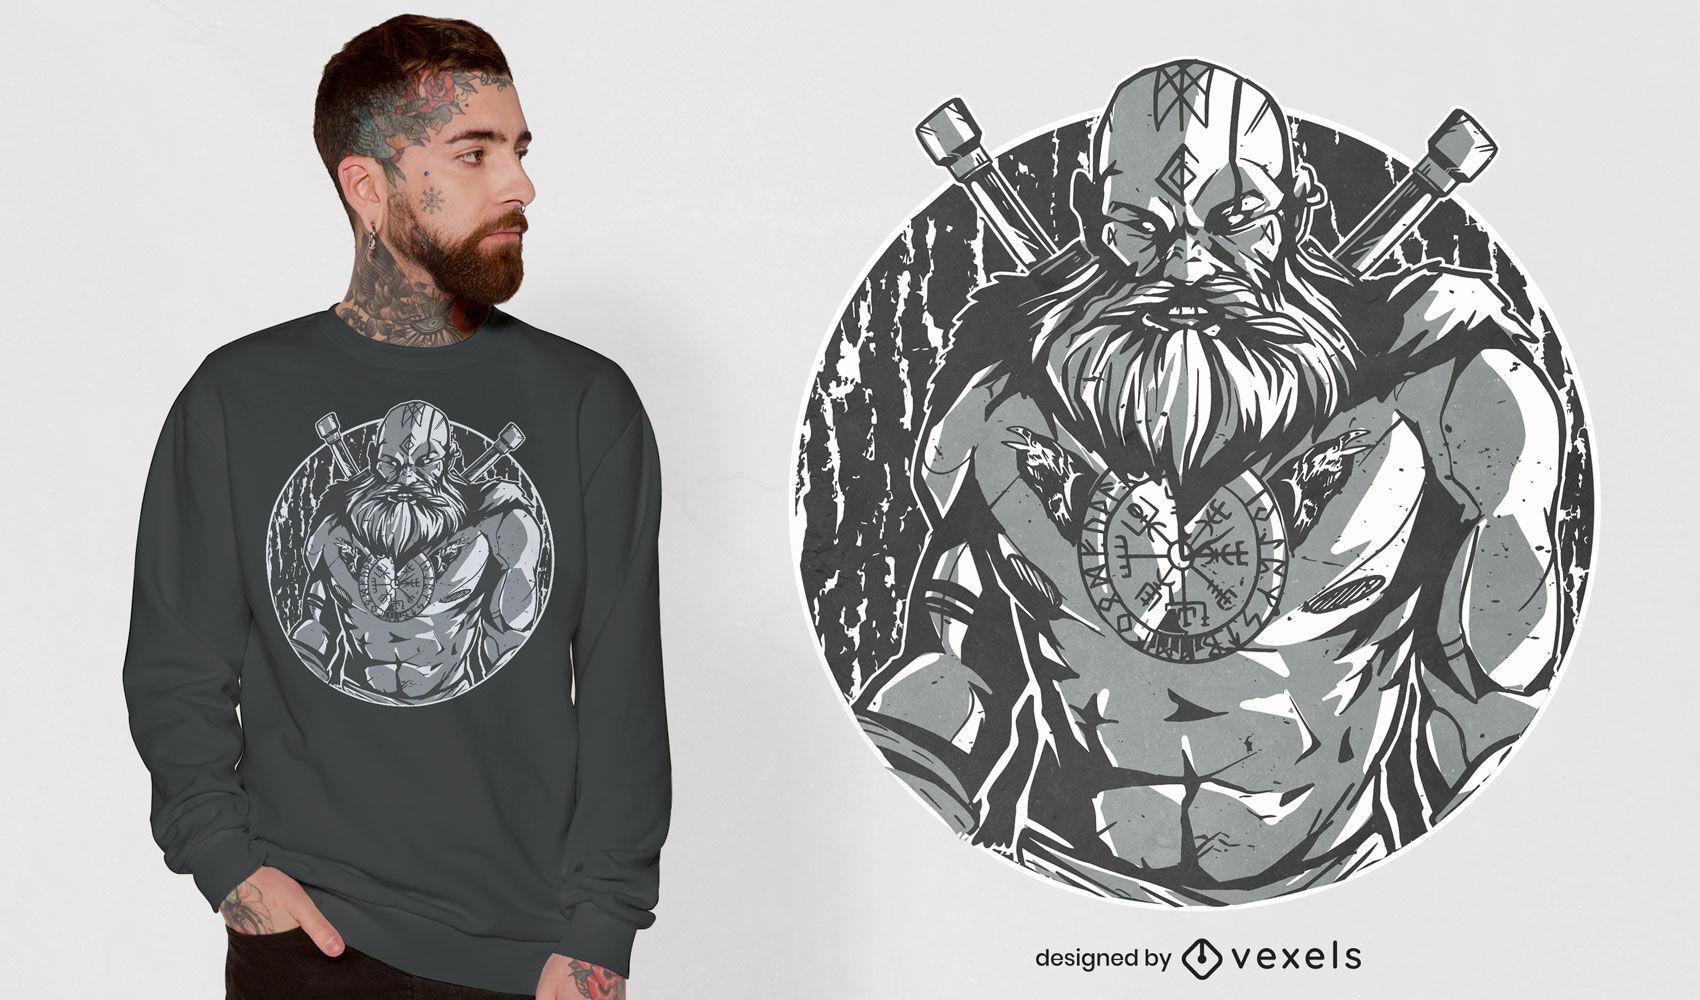 Diseño de camiseta de guerrero vikingo monocromático.